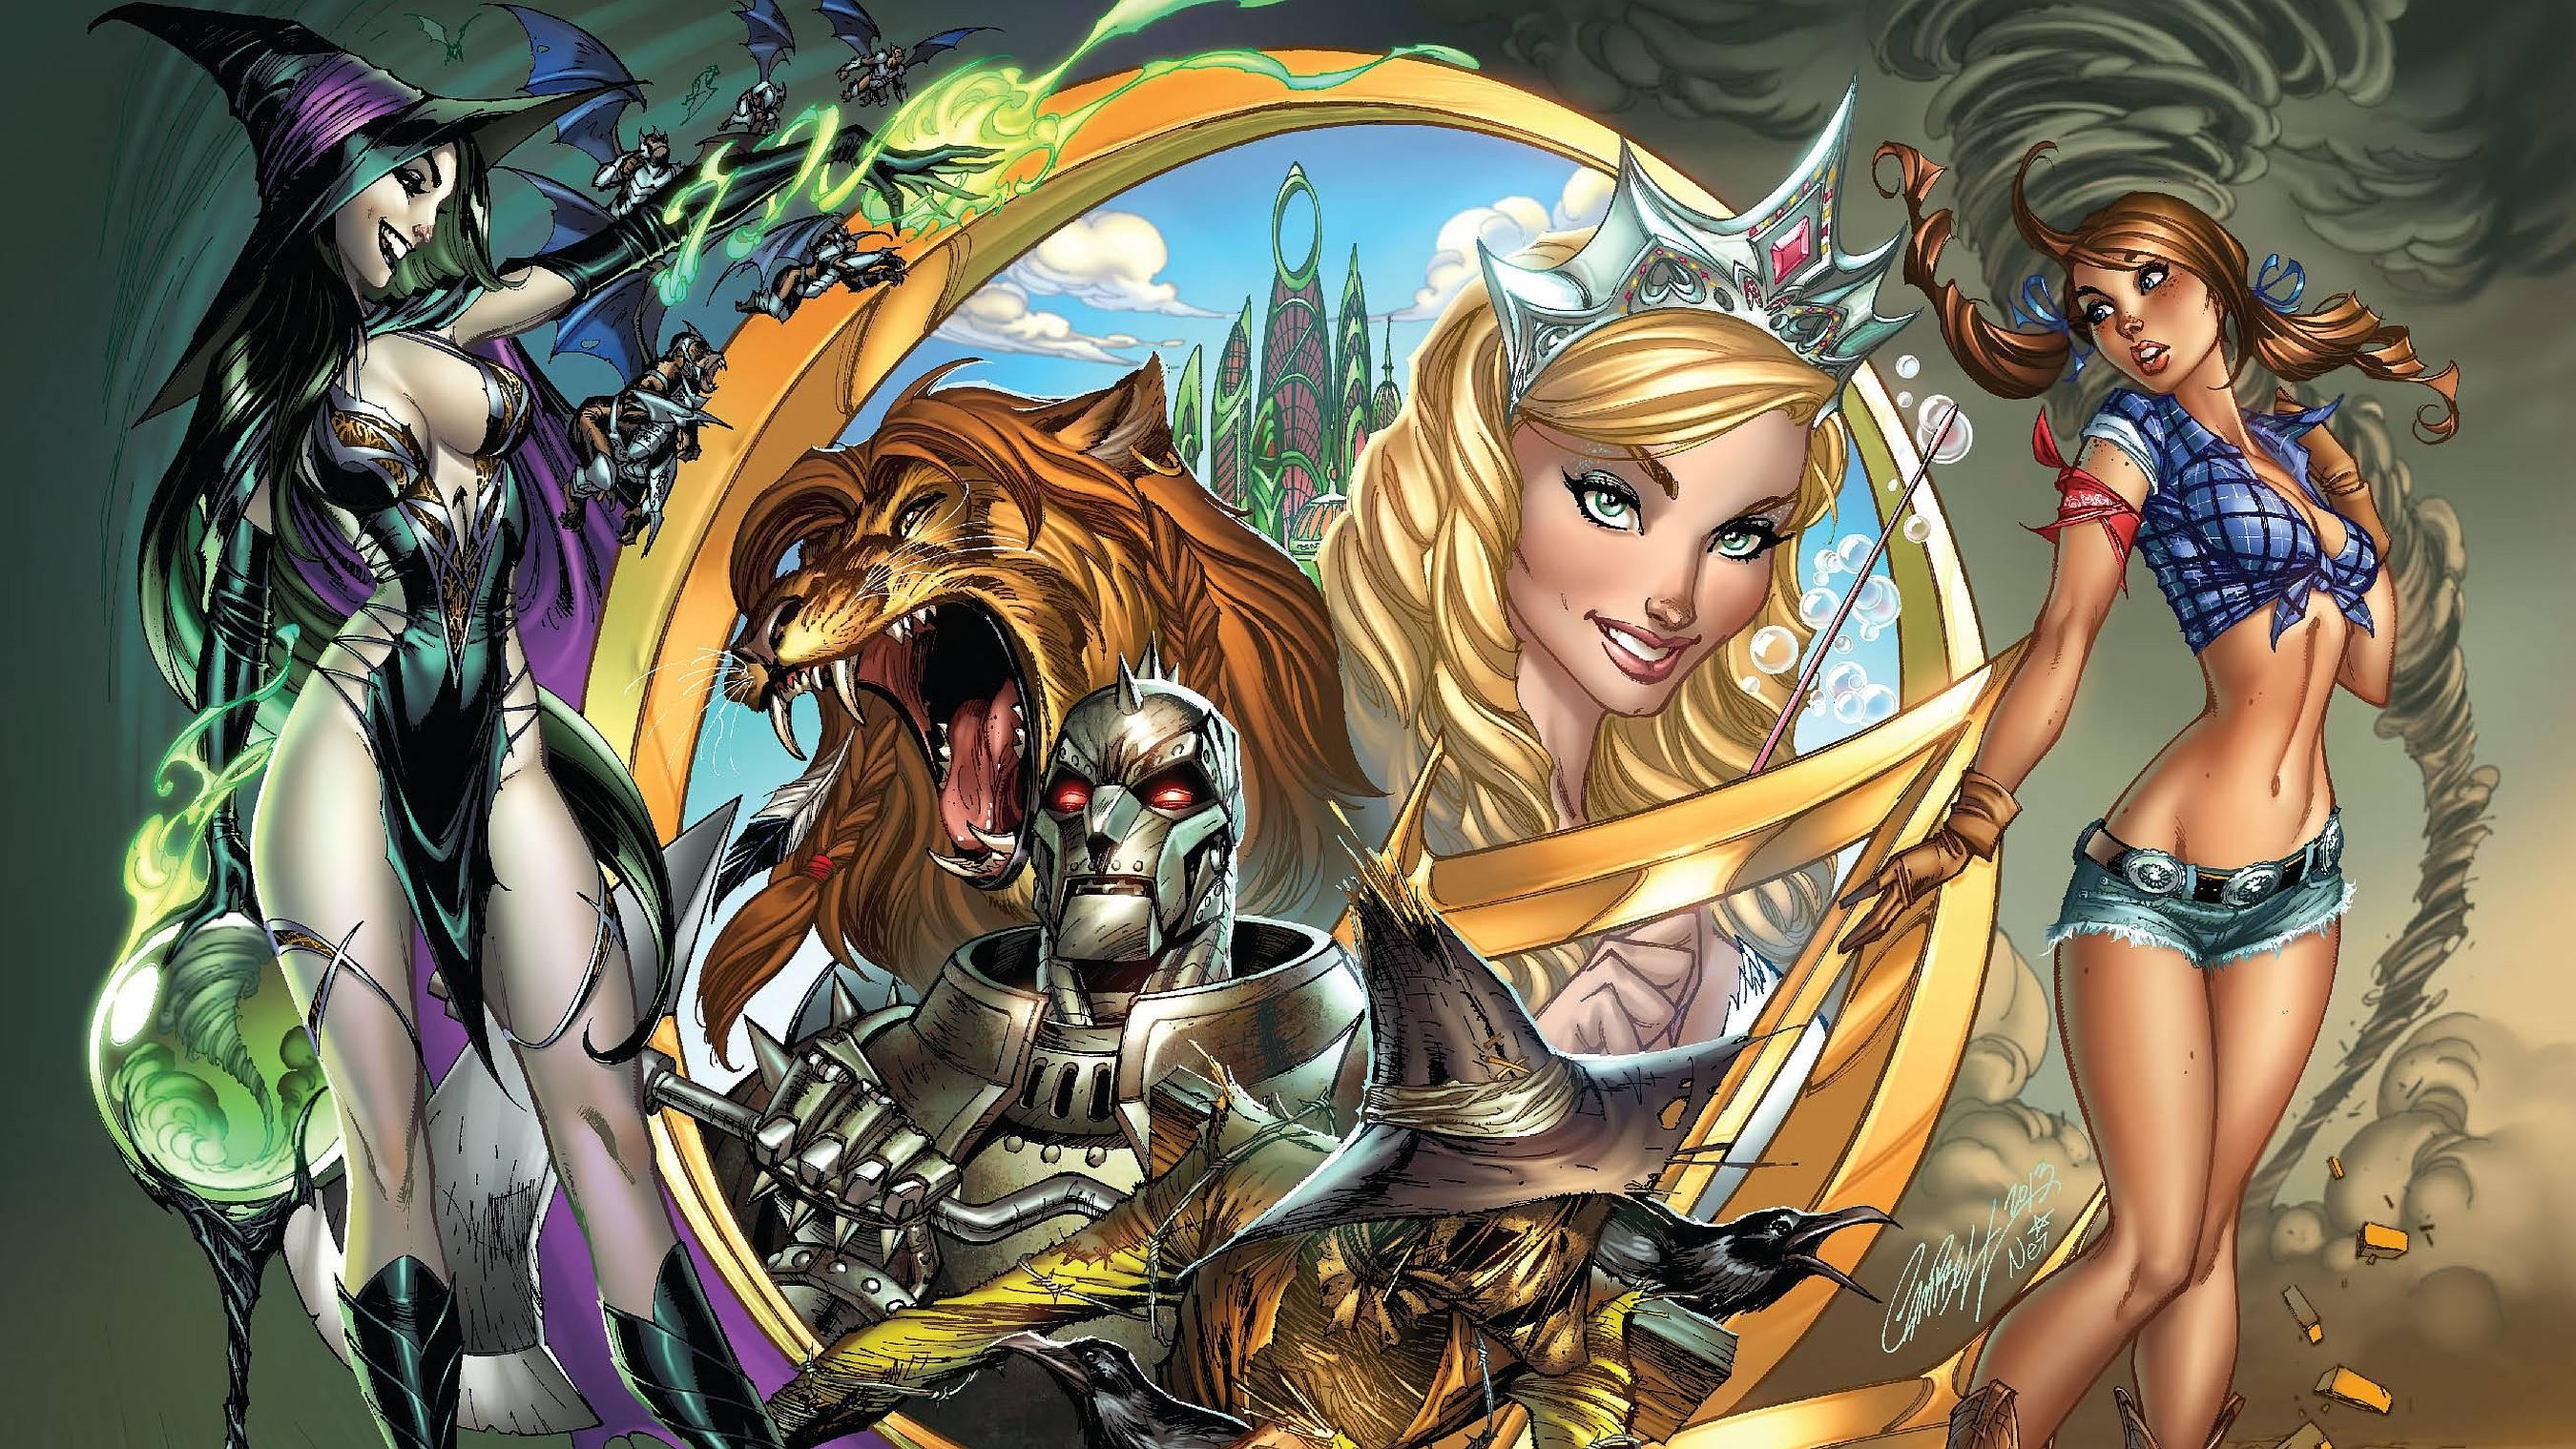 Grimm Fairy Tales: Sleepy Hollow wallpapers, Comics, HQ